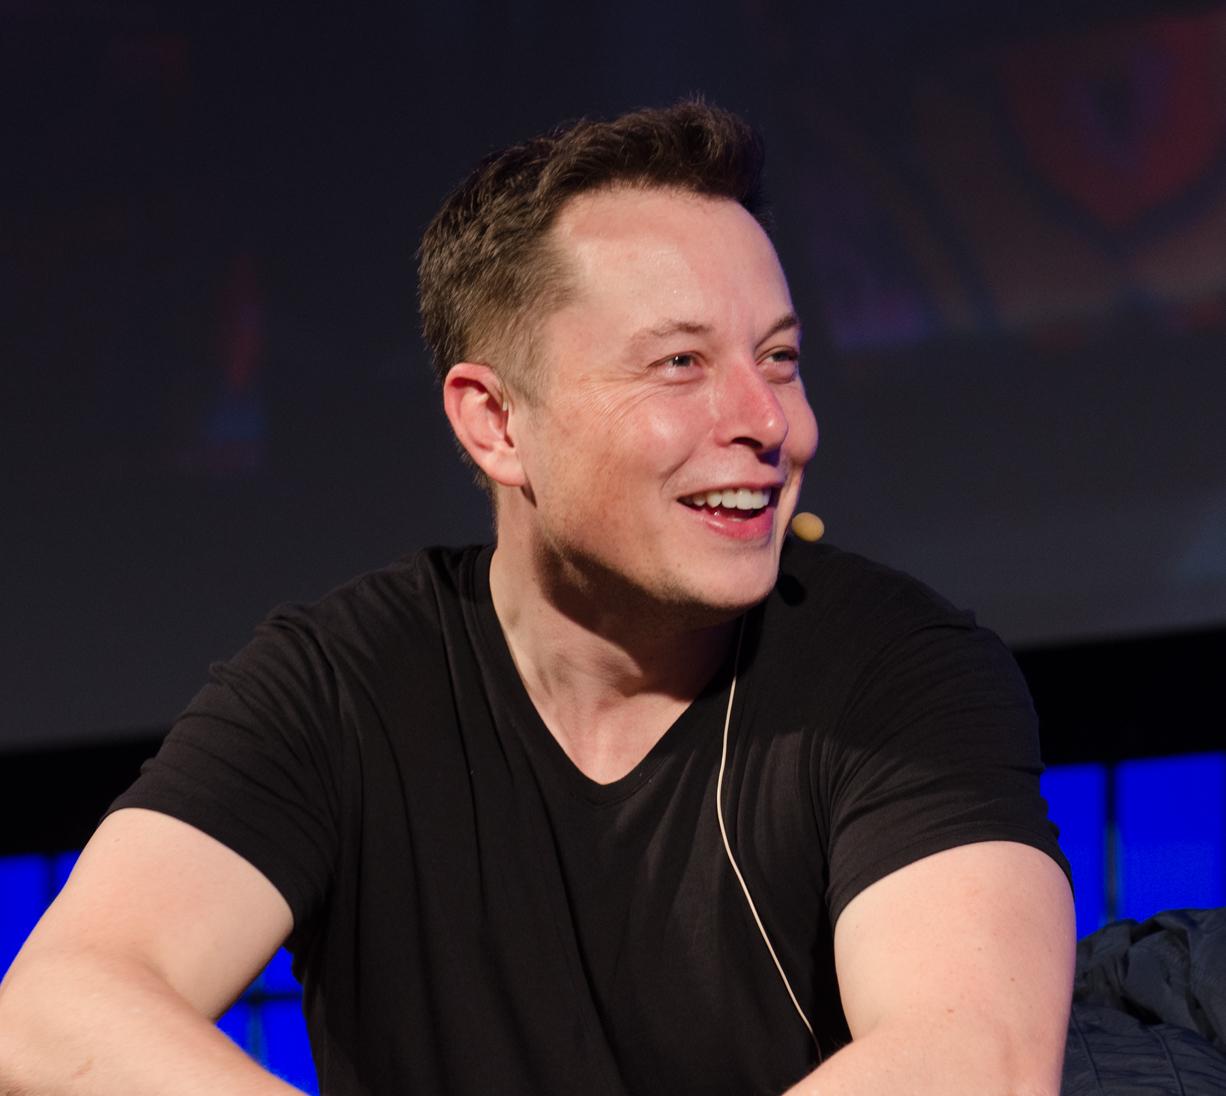 Elon Musk: Elon Musk announces Tesla beer